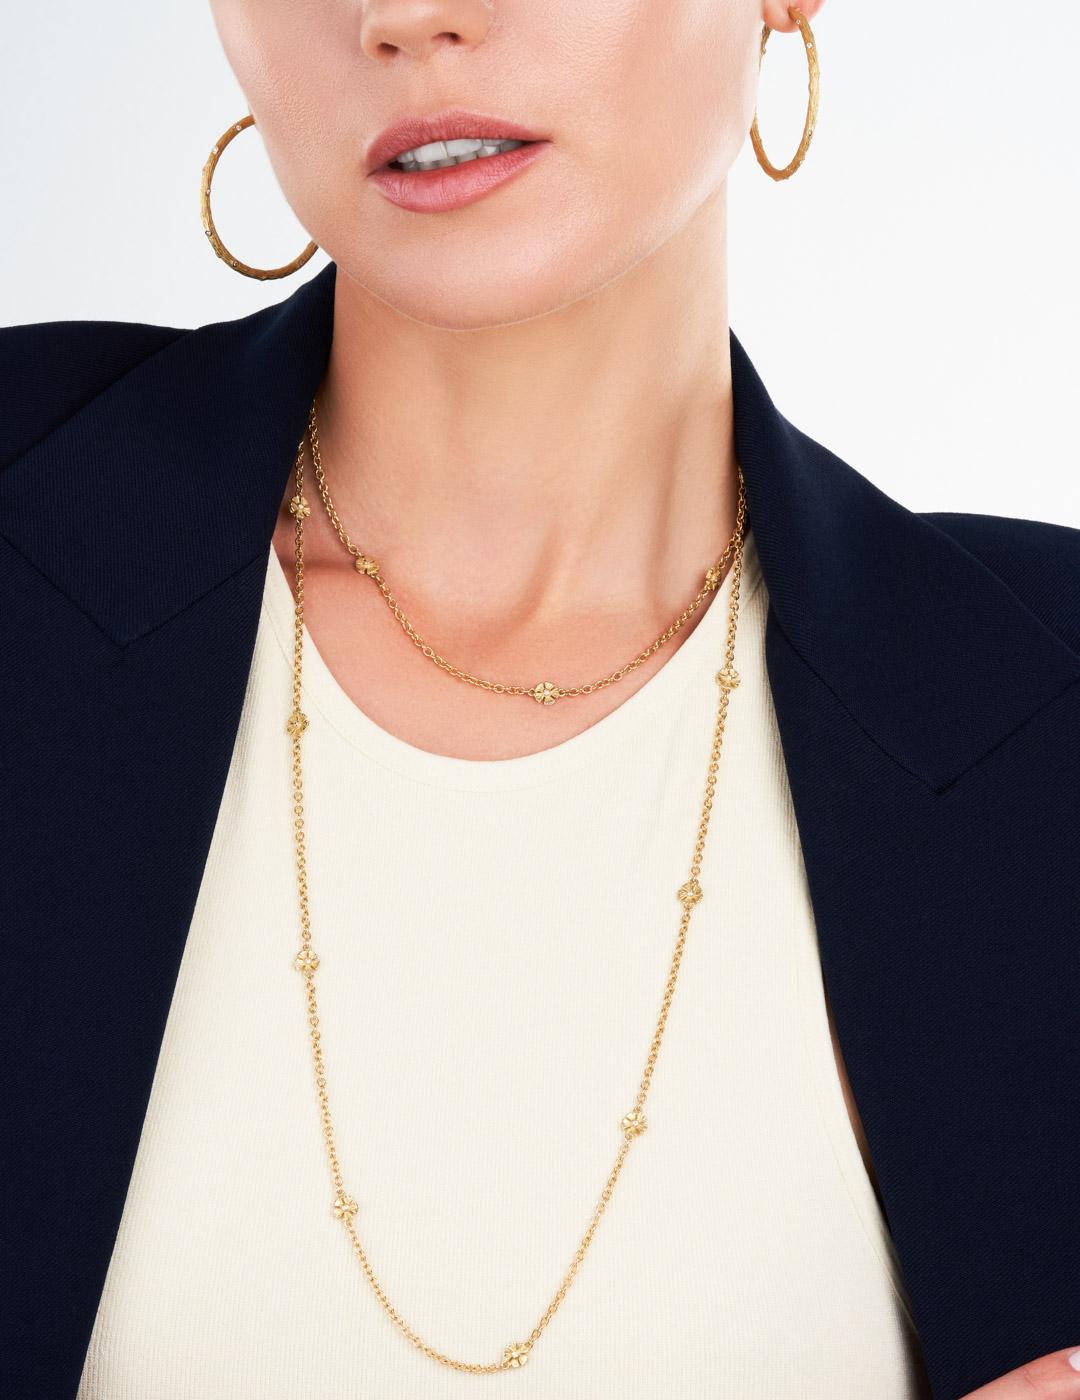 mish_products_earrings_Twig-XL Hoop YG-ER-4